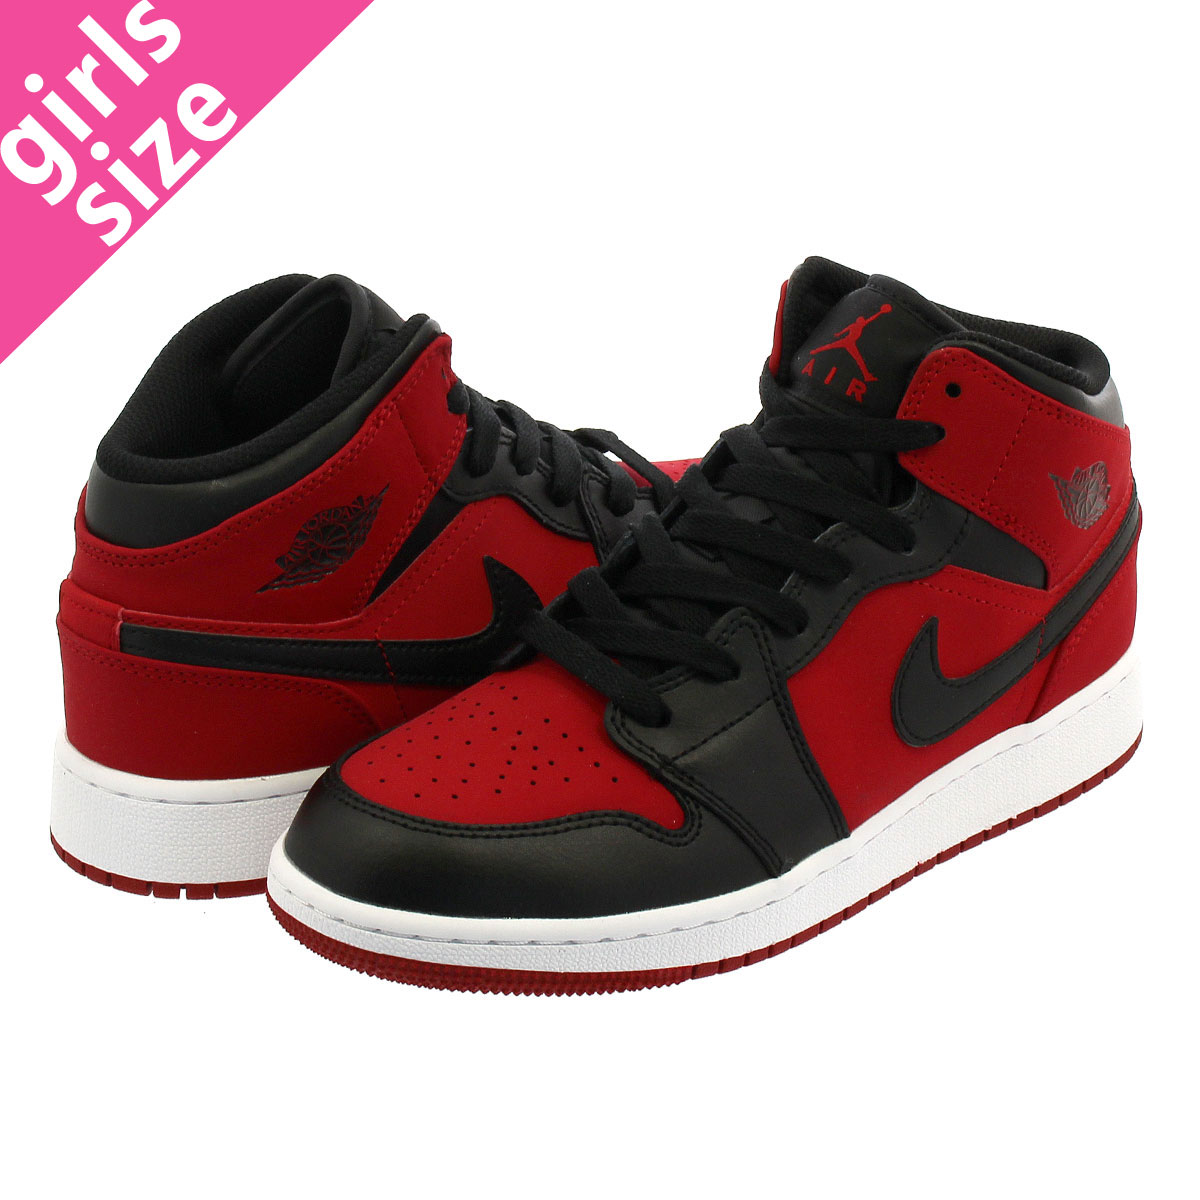 c531739de8e3cf SELECT SHOP LOWTEX  NIKE AIR JORDAN 1 MID GS Nike Air Jordan 1 mid GS GYM  RED BLACK WHITE 554